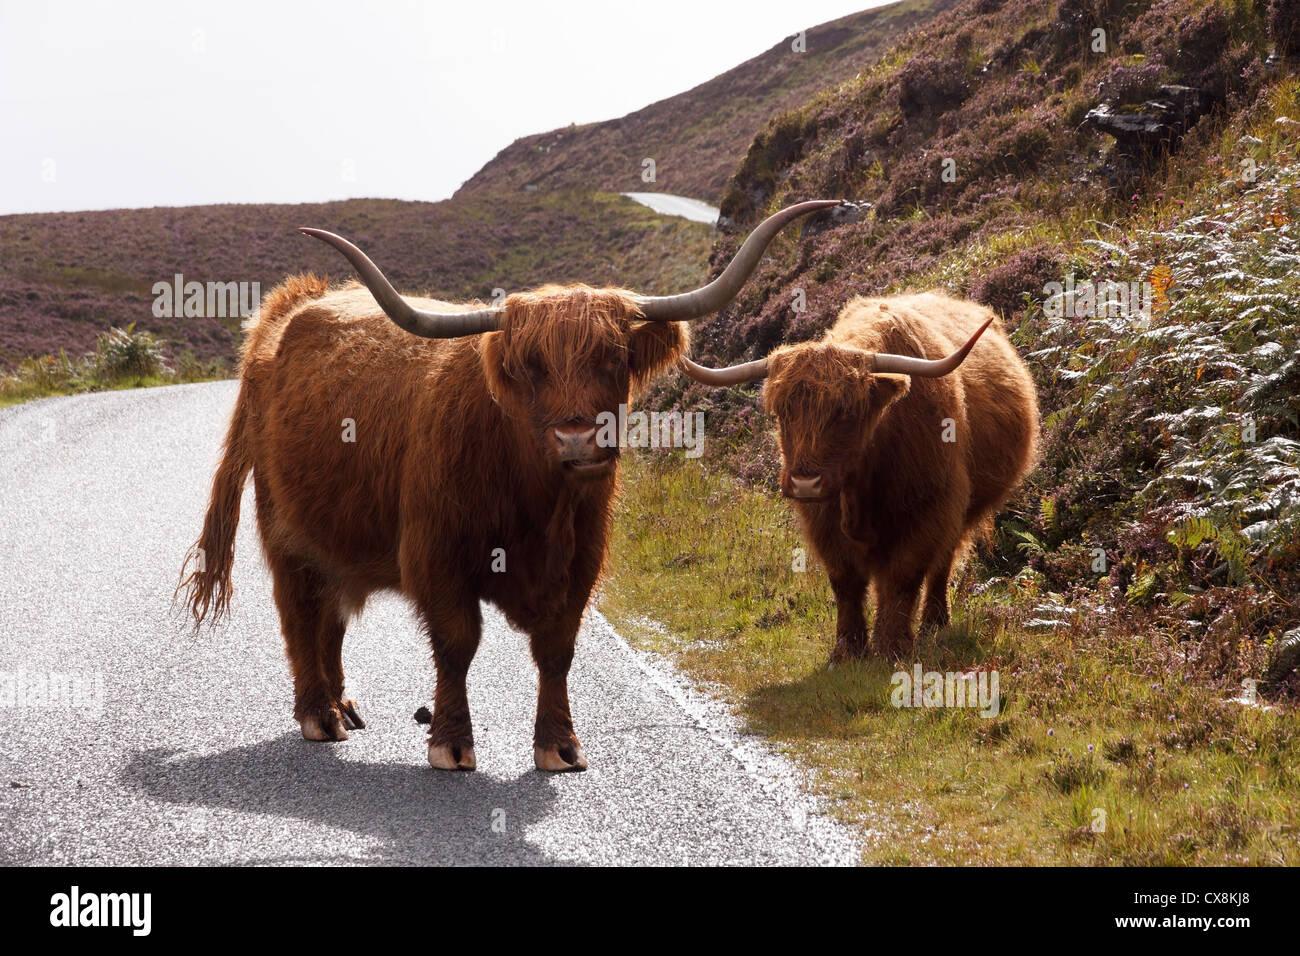 Roadblock! Scottish Highland cattle/ cows blocking the road near Elgol, Isle of Skye, Scotland, UK - Stock Image